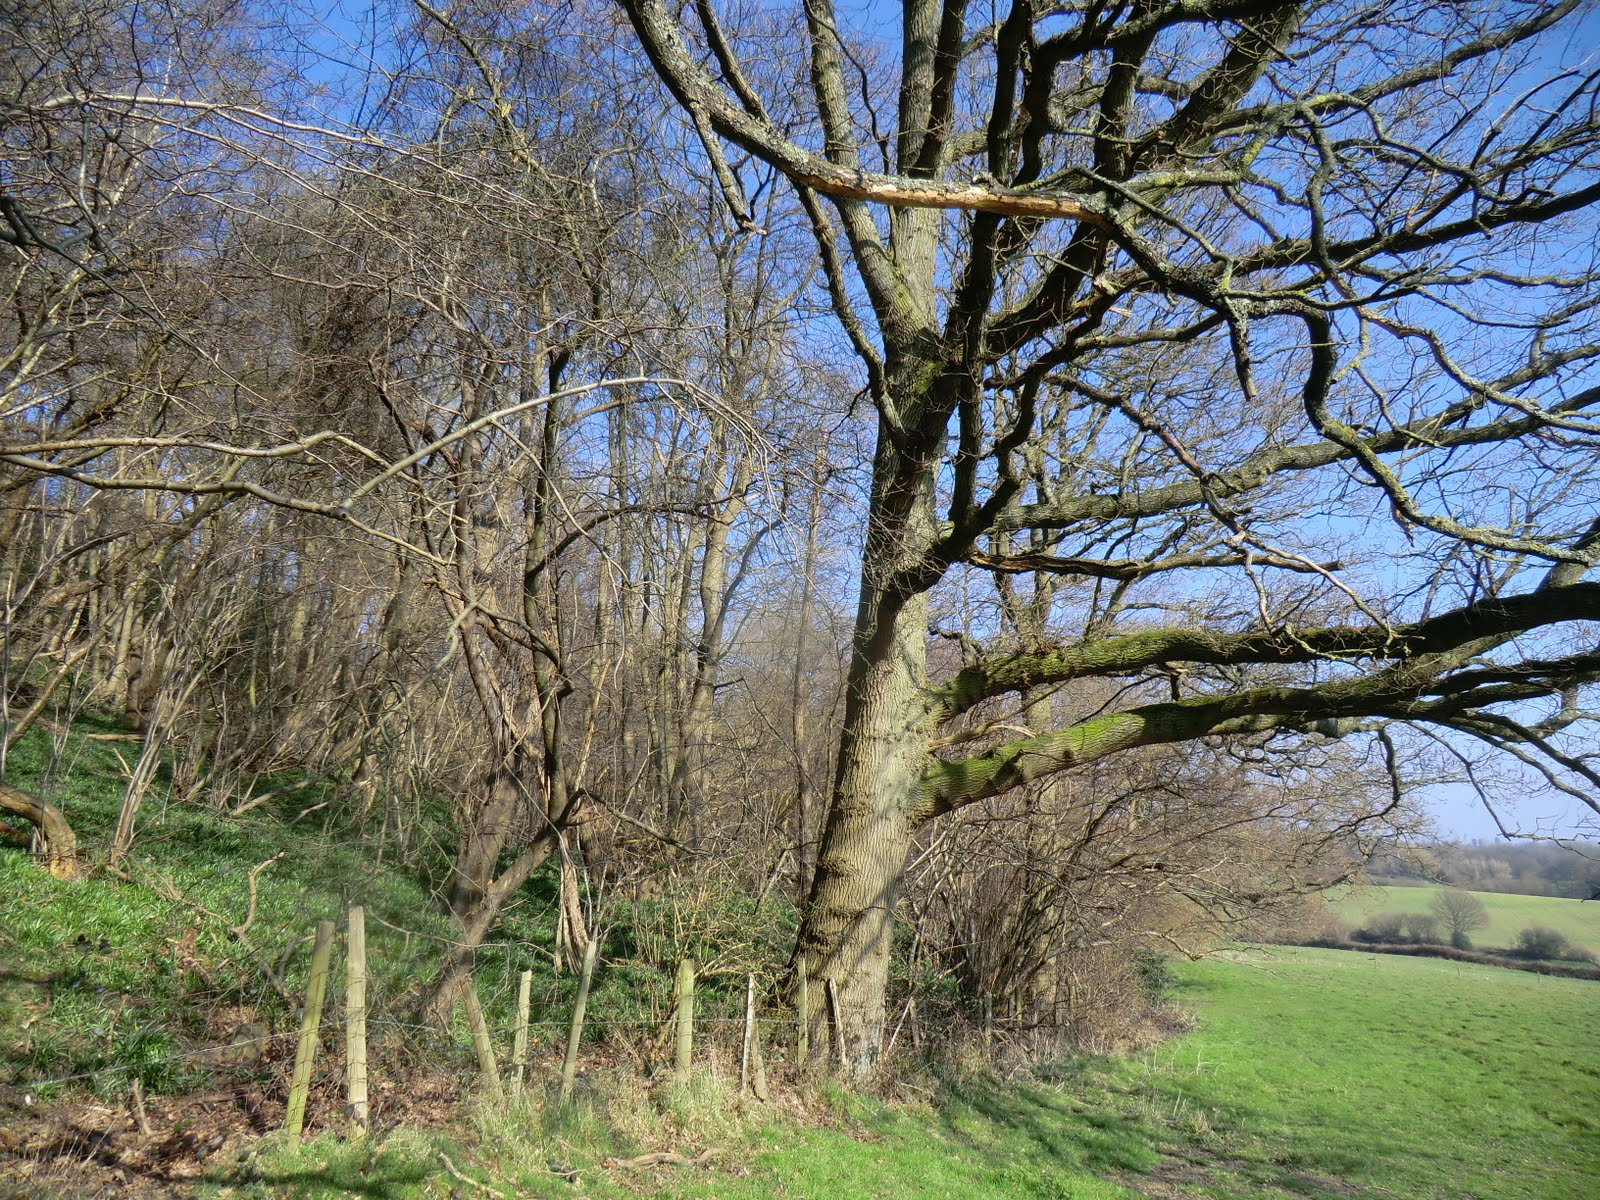 CIMG2891 Alongside the bottom of Tenchleys Wood